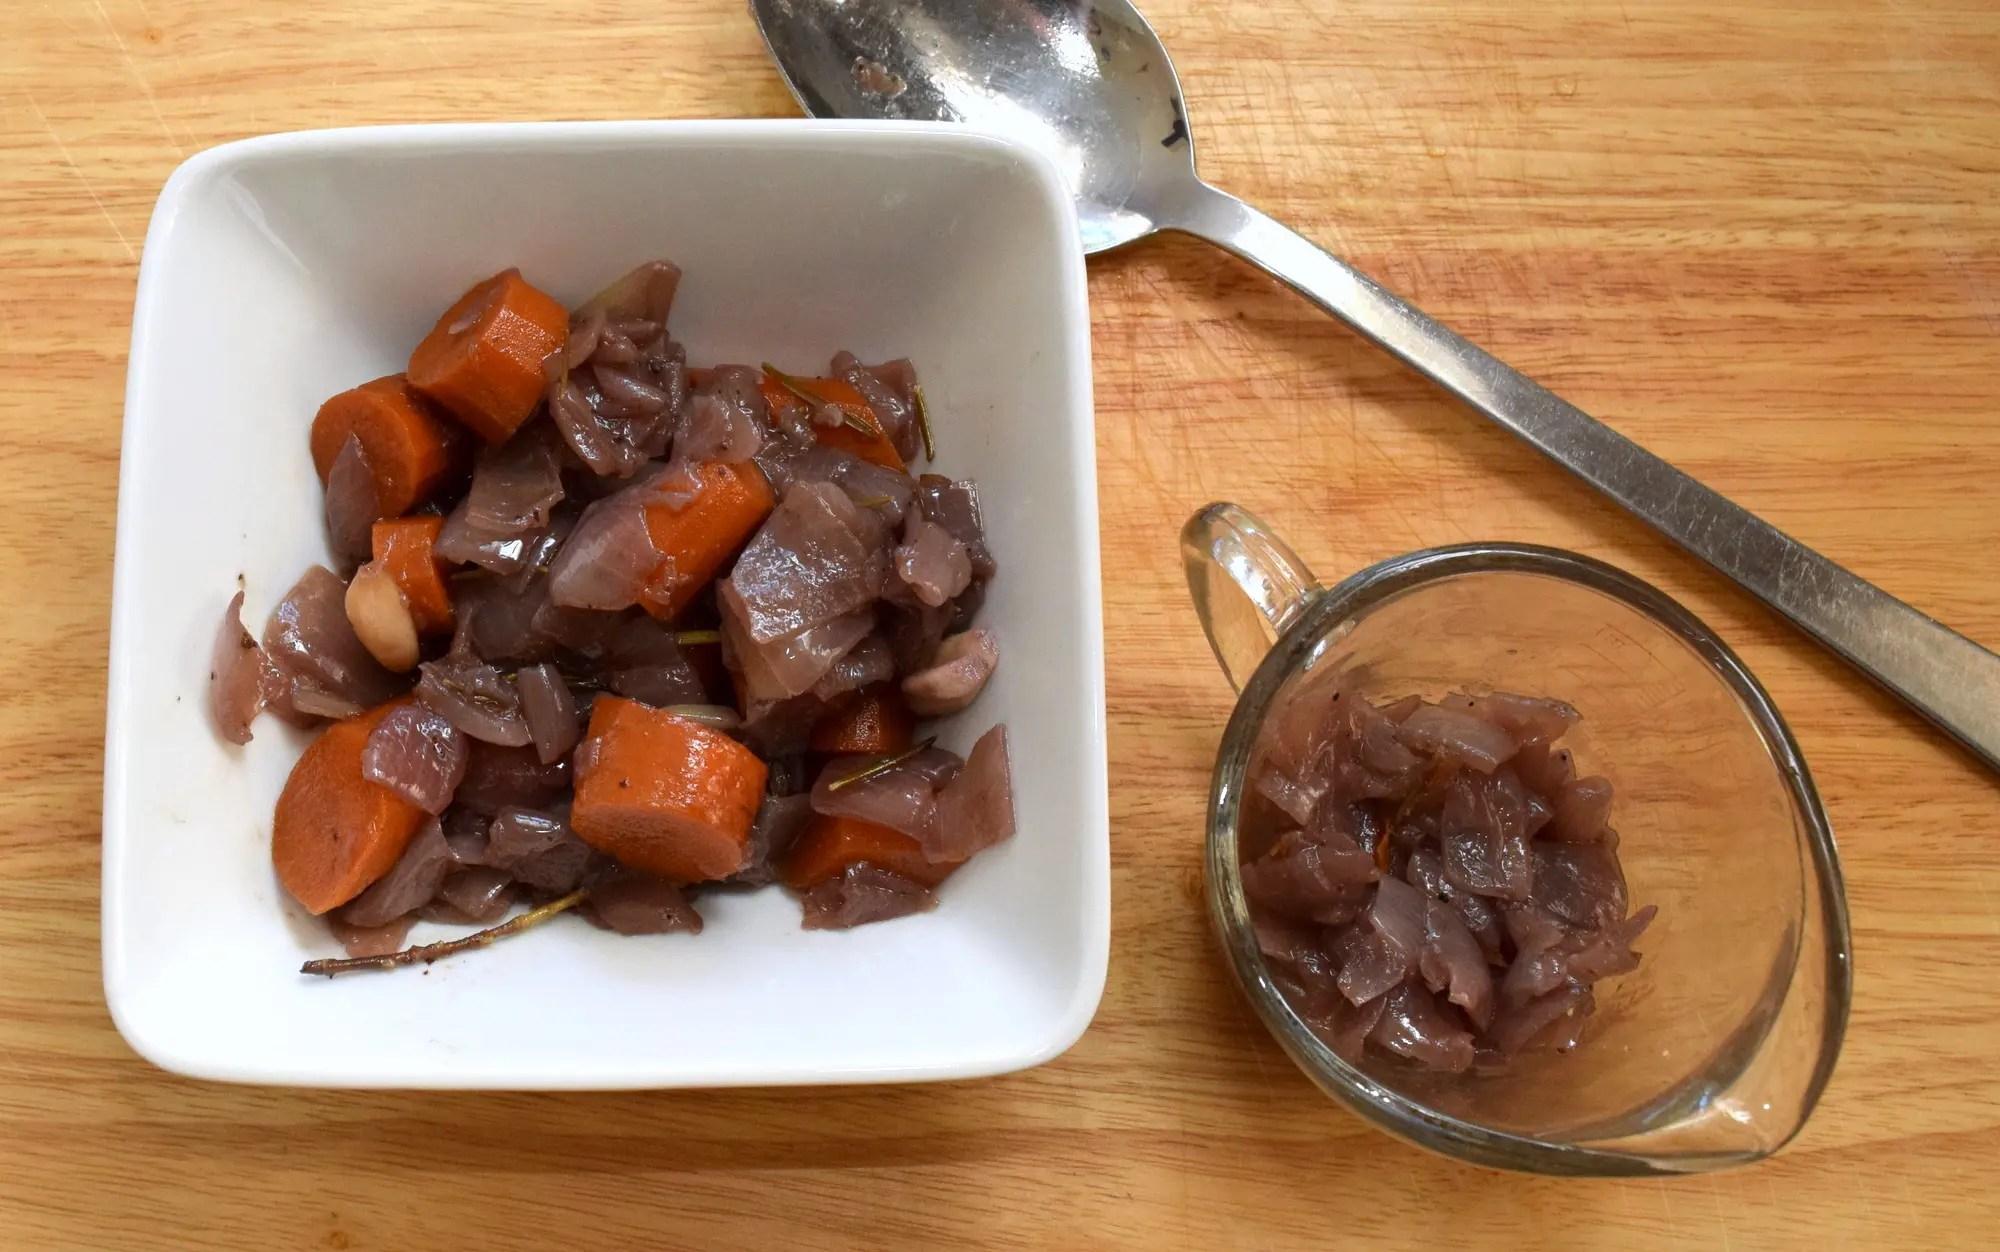 Maple Glazed, Braised Beef Short Ribs